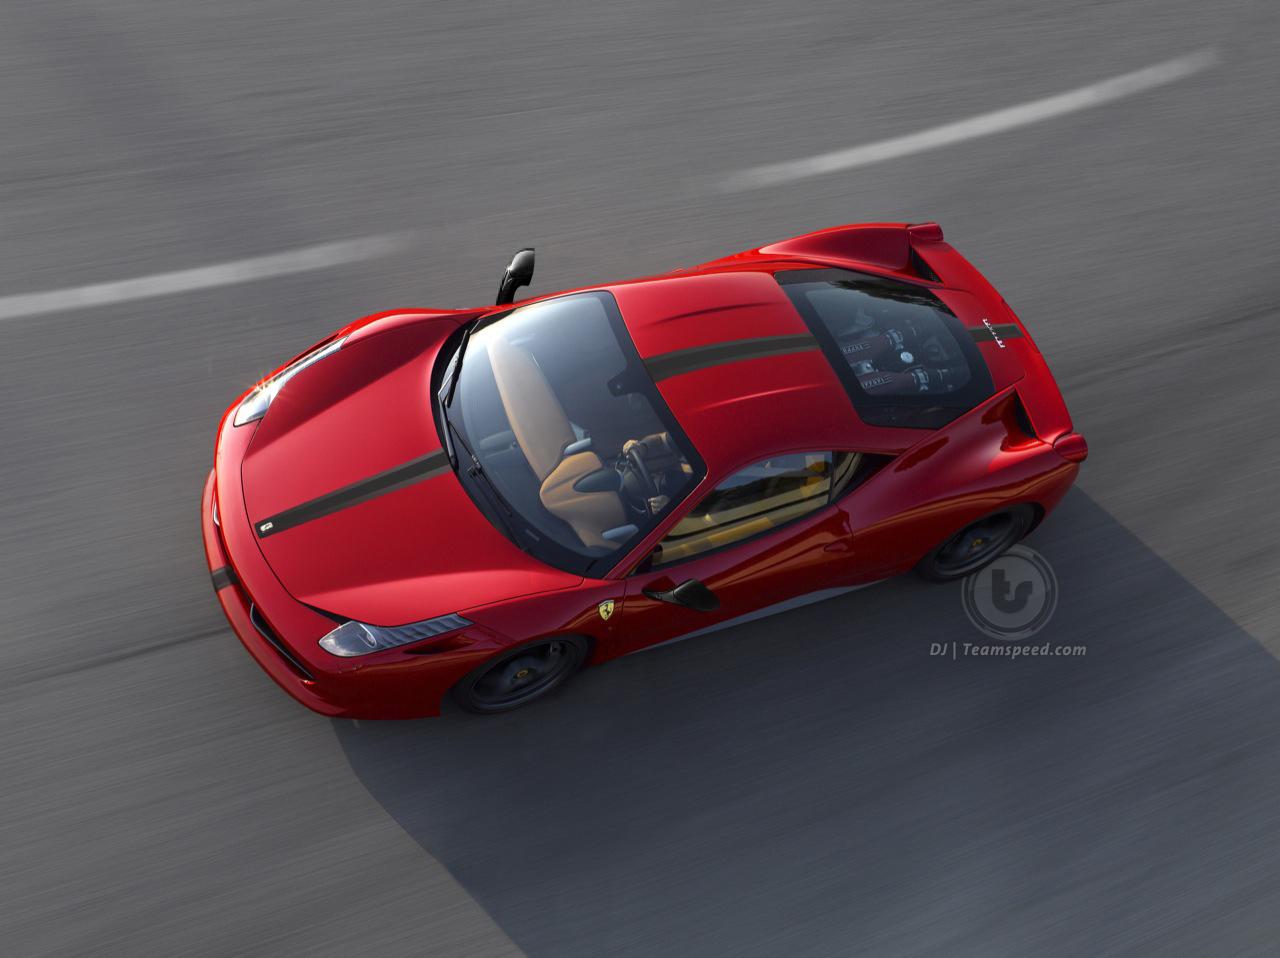 http://images.caradisiac.com/logos/1/4/5/3/131453/S0-Ferrari-458-Scuderia-comme-ca-35688.jpg